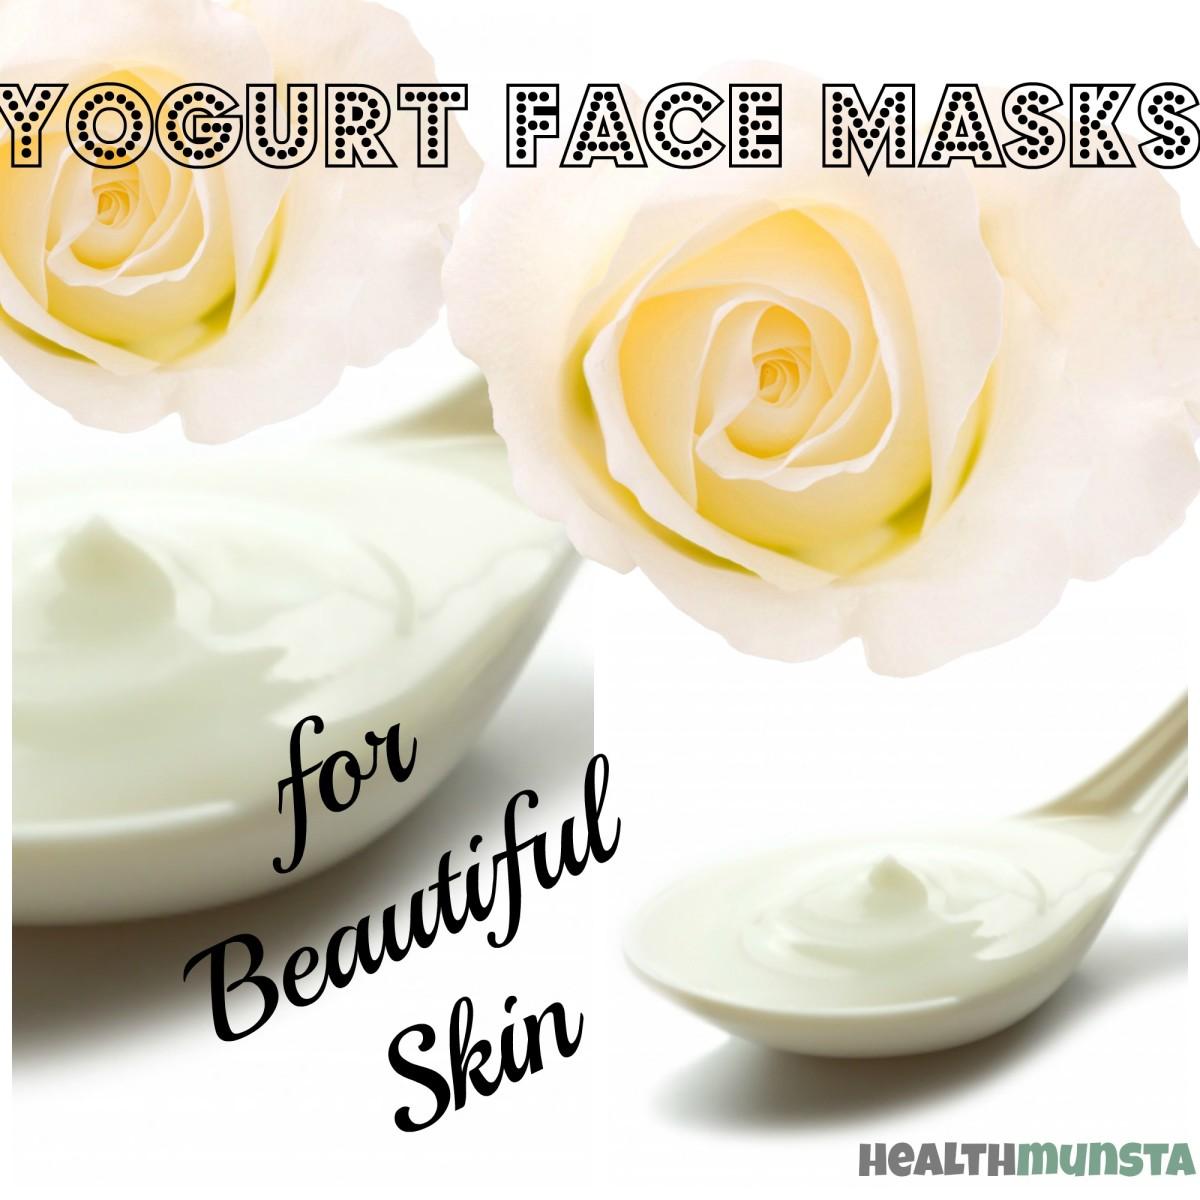 DIY: Homemade Yogurt Face Mask Recipes for Beautiful Skin